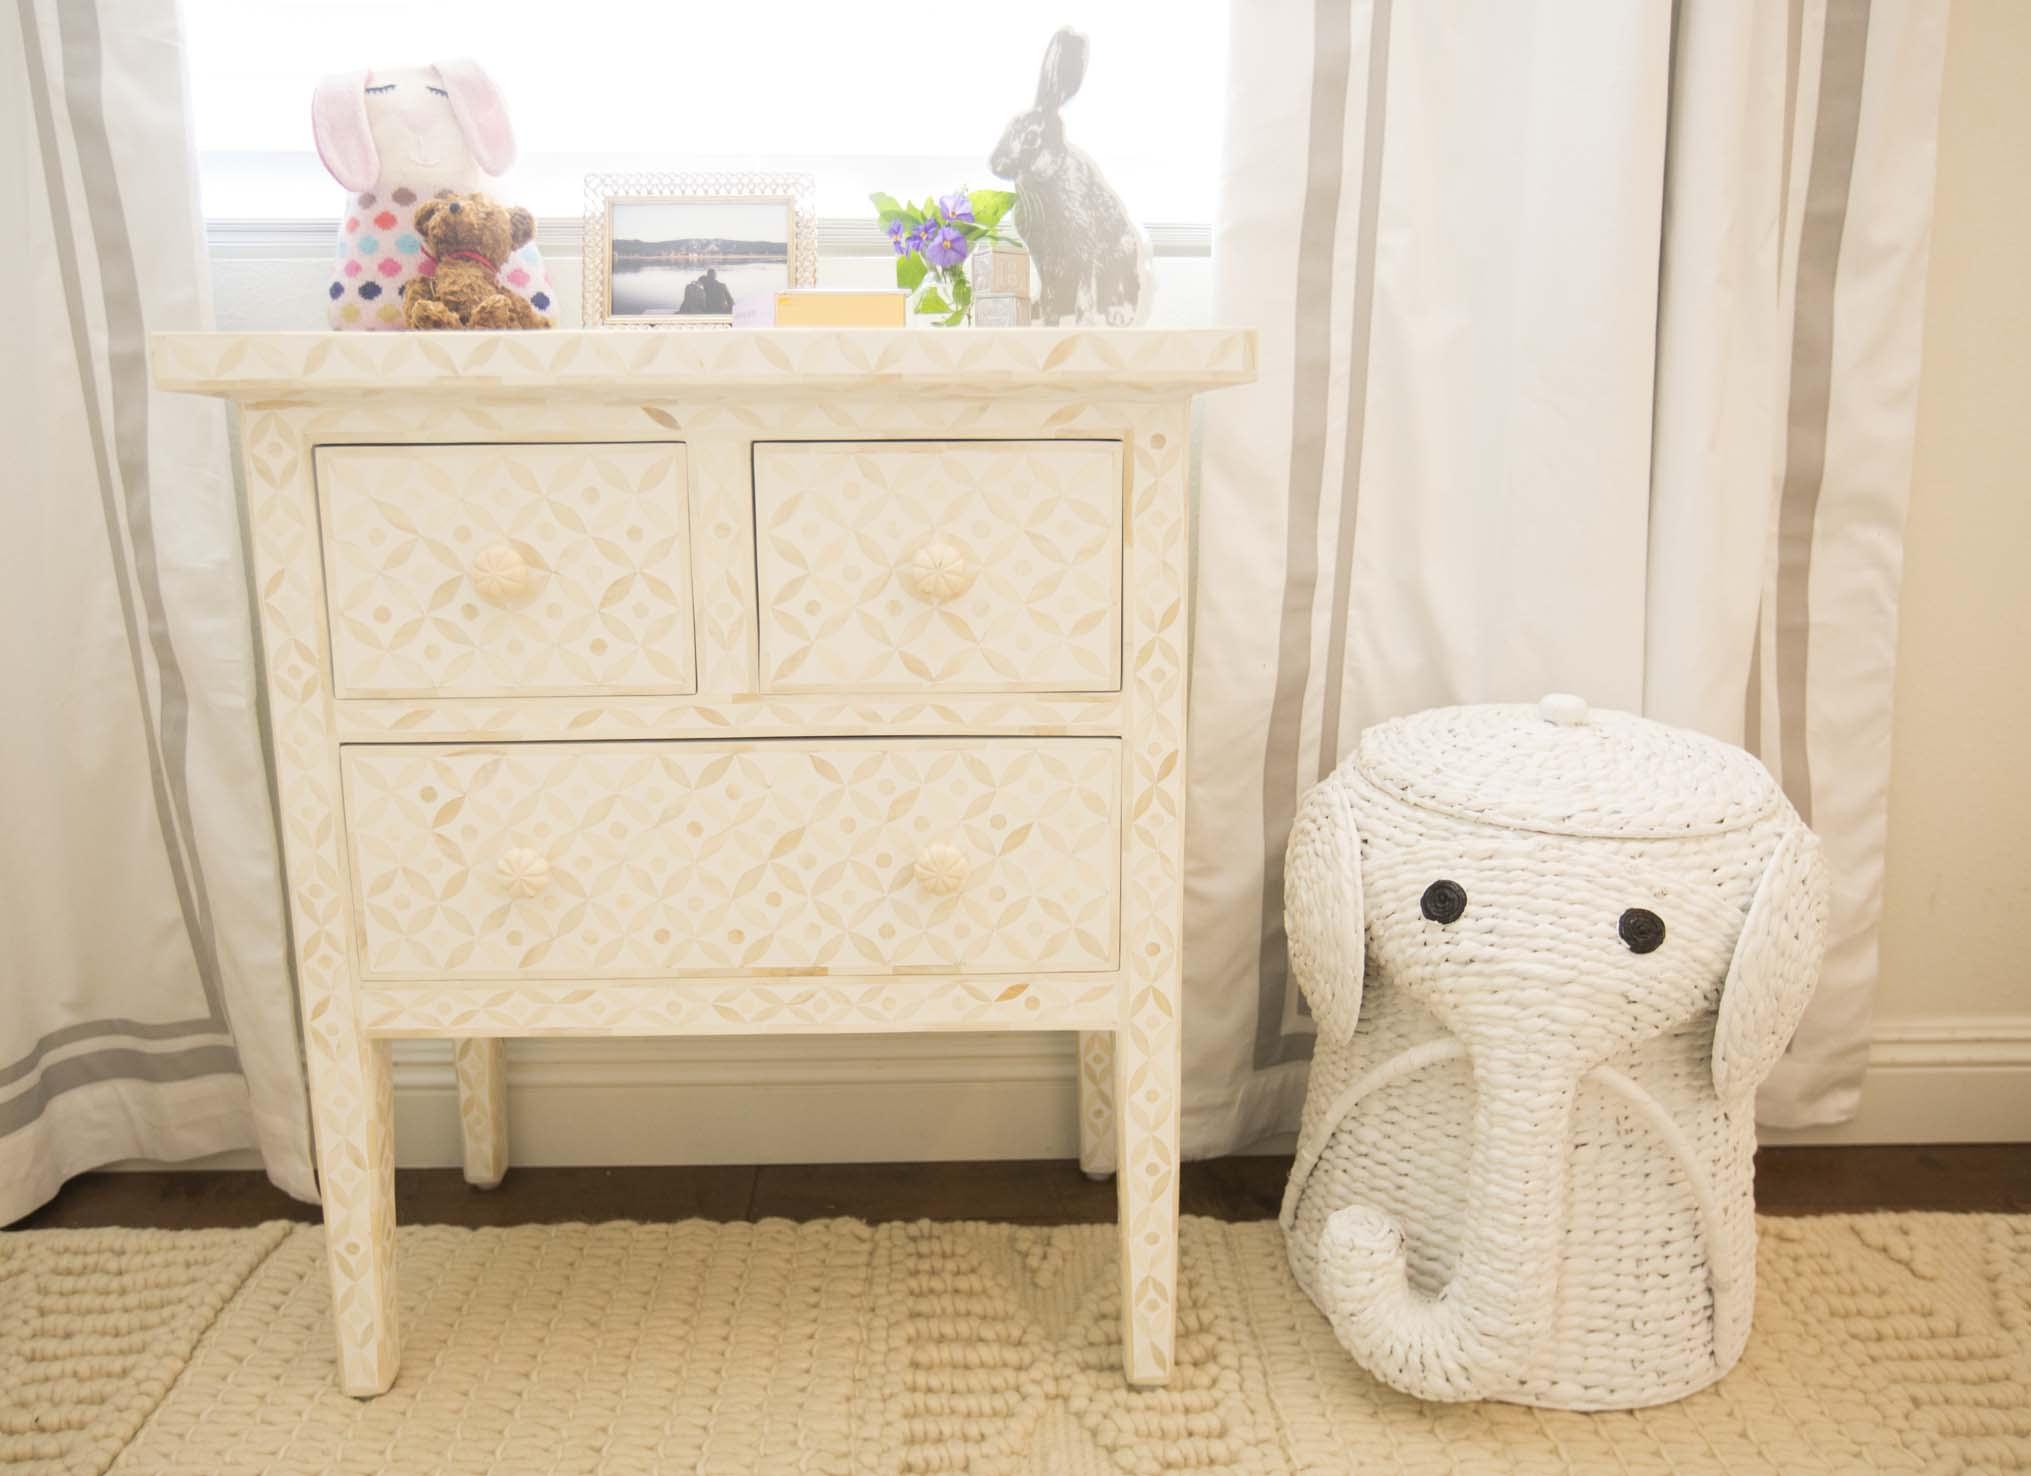 chriselle lim of the chriselle factor shares her nursery design